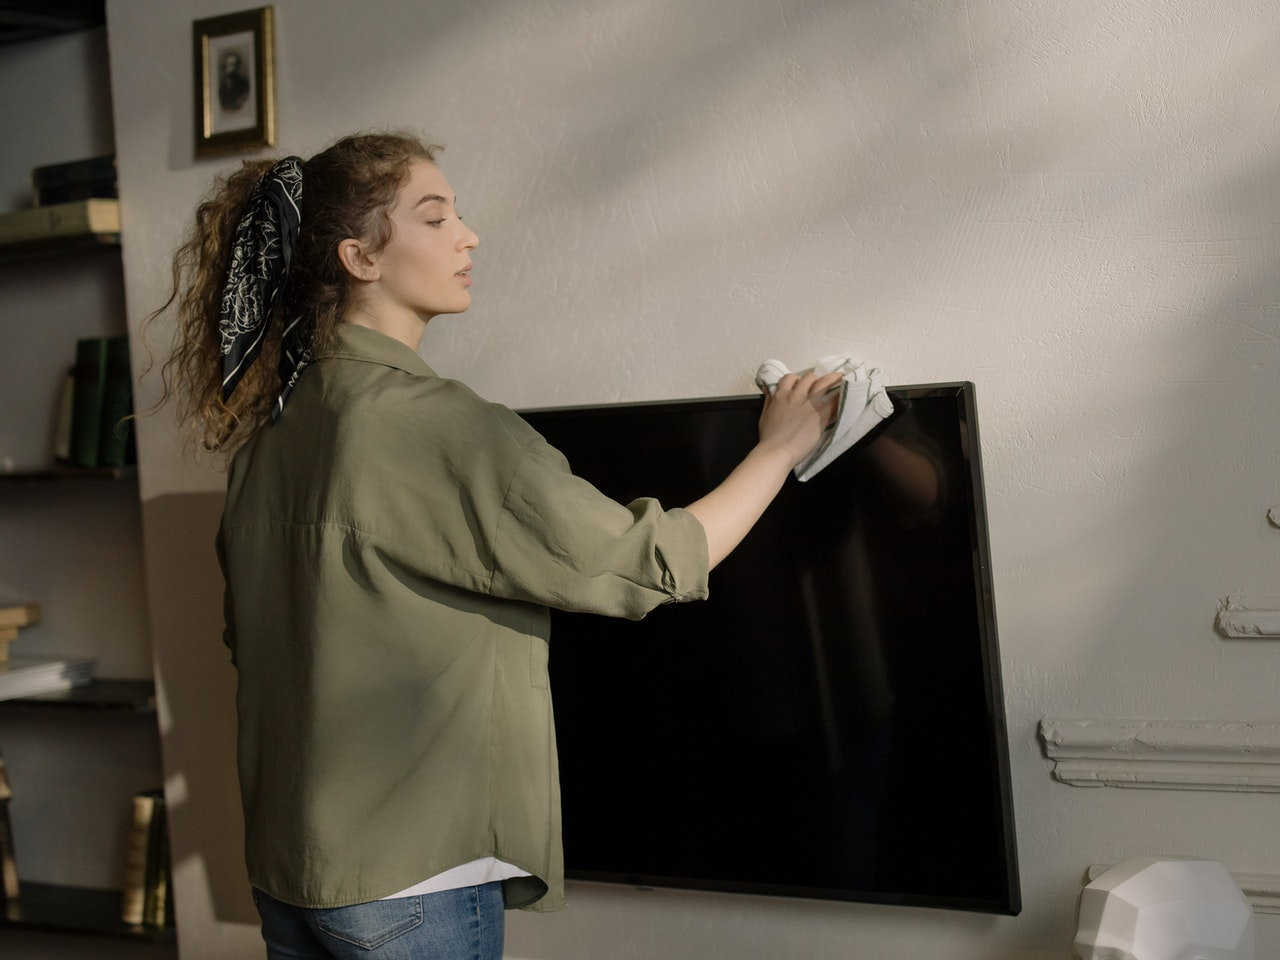 pulire lo schermo tv